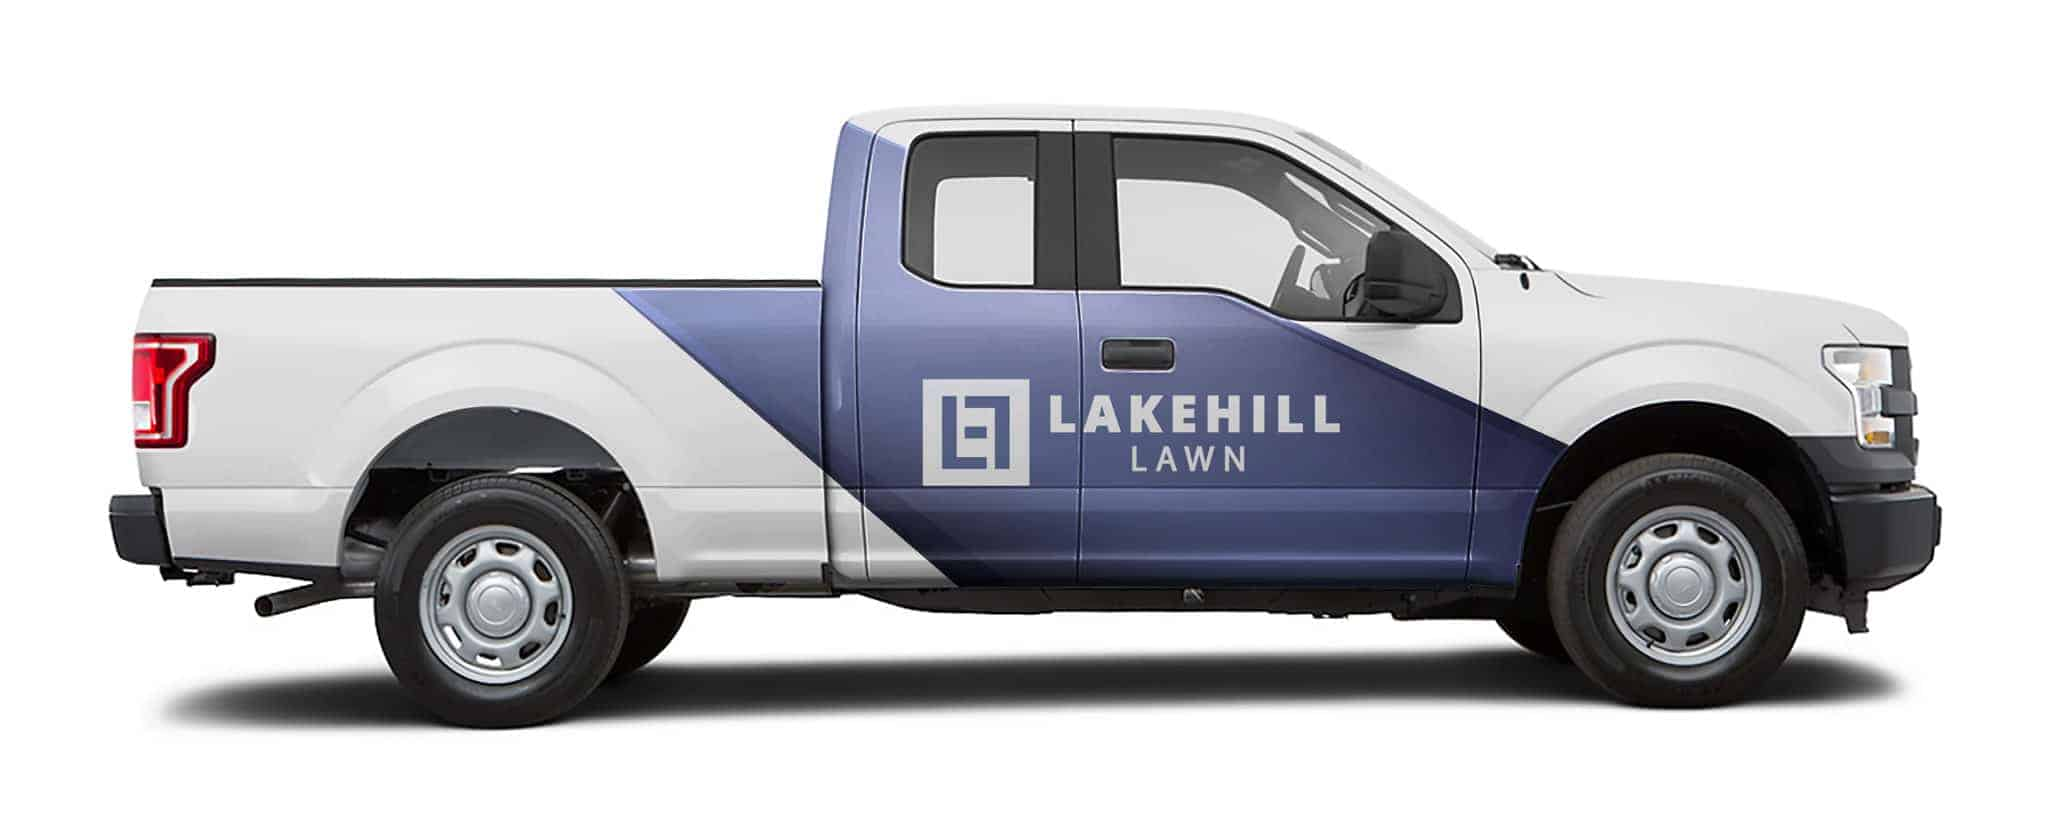 Lakehilll Lawn Truck